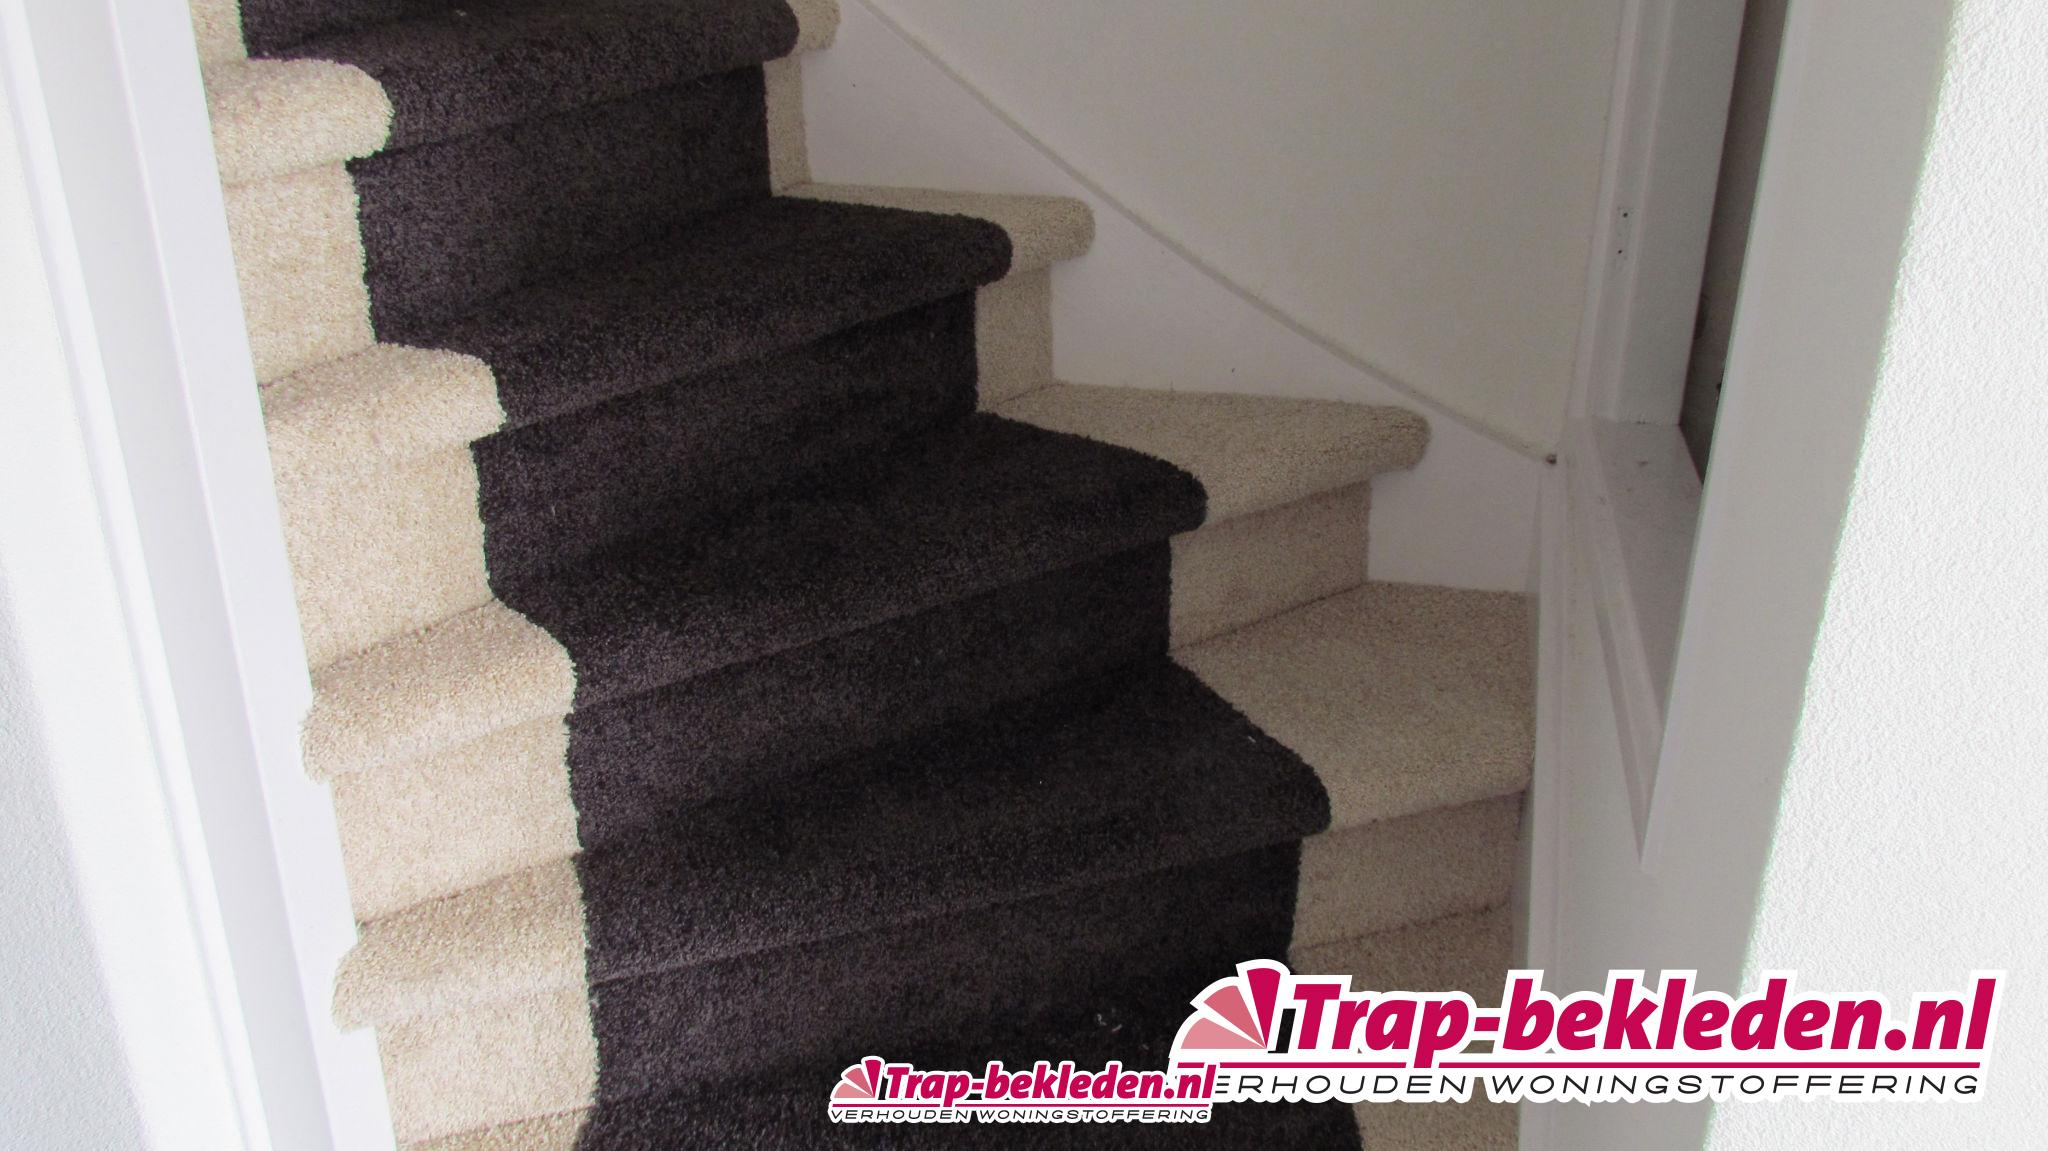 Trap Tapijt Leggen : Vloerbedekking trap leggen trap bekleden